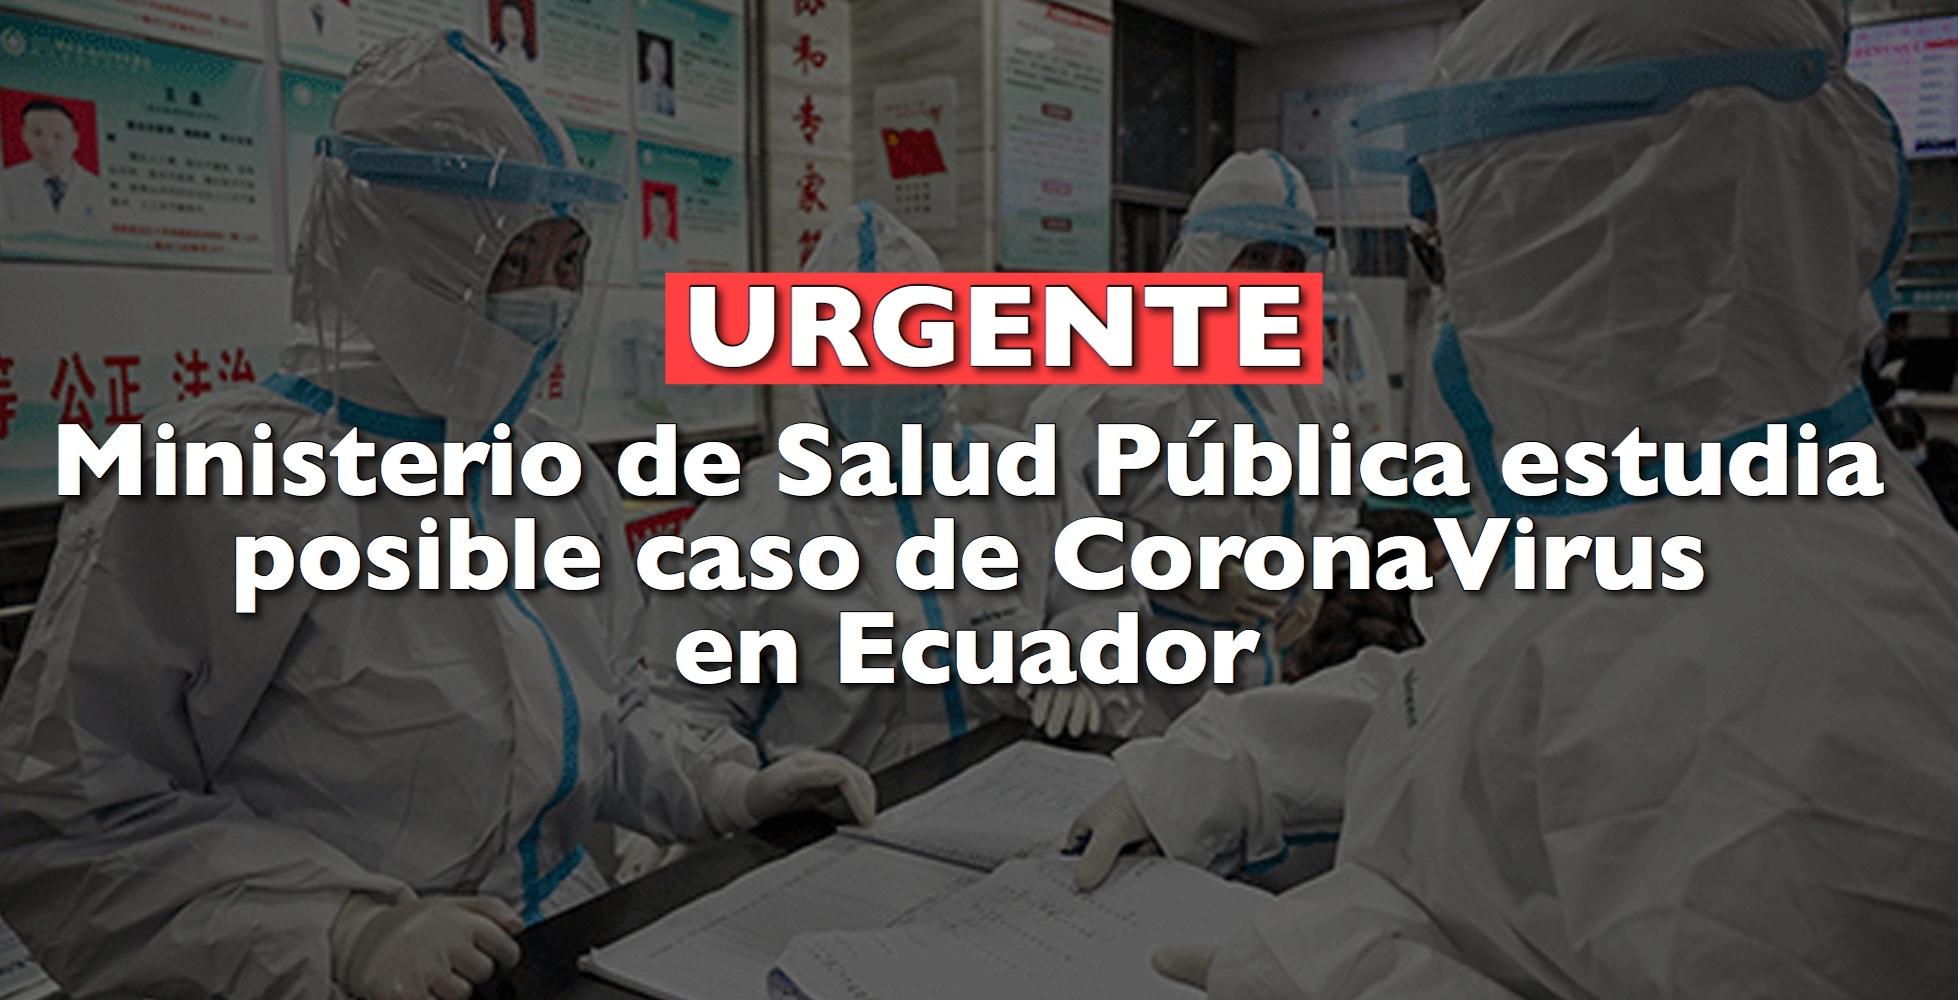 Ministerio de Salud Pública estudia posible caso de CoronaVirus en Ecuador